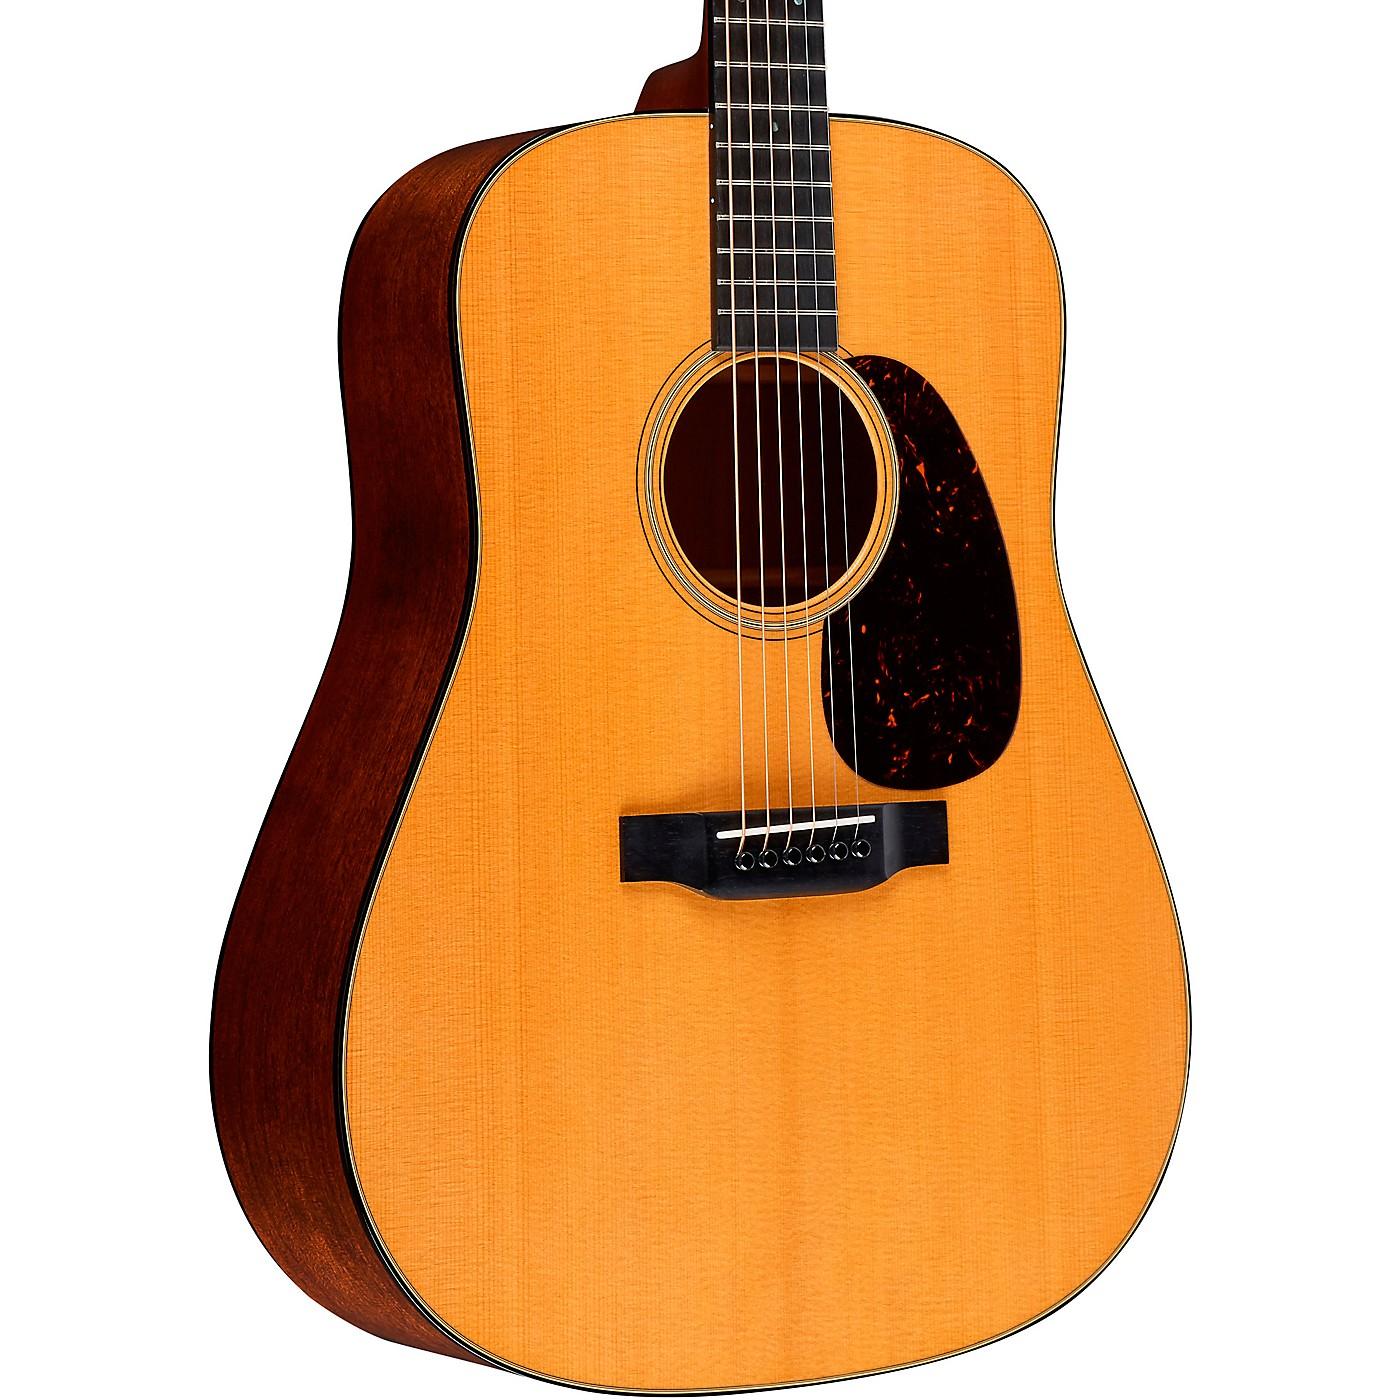 Martin Special 18 Style Dreadnought VTS Guitar thumbnail